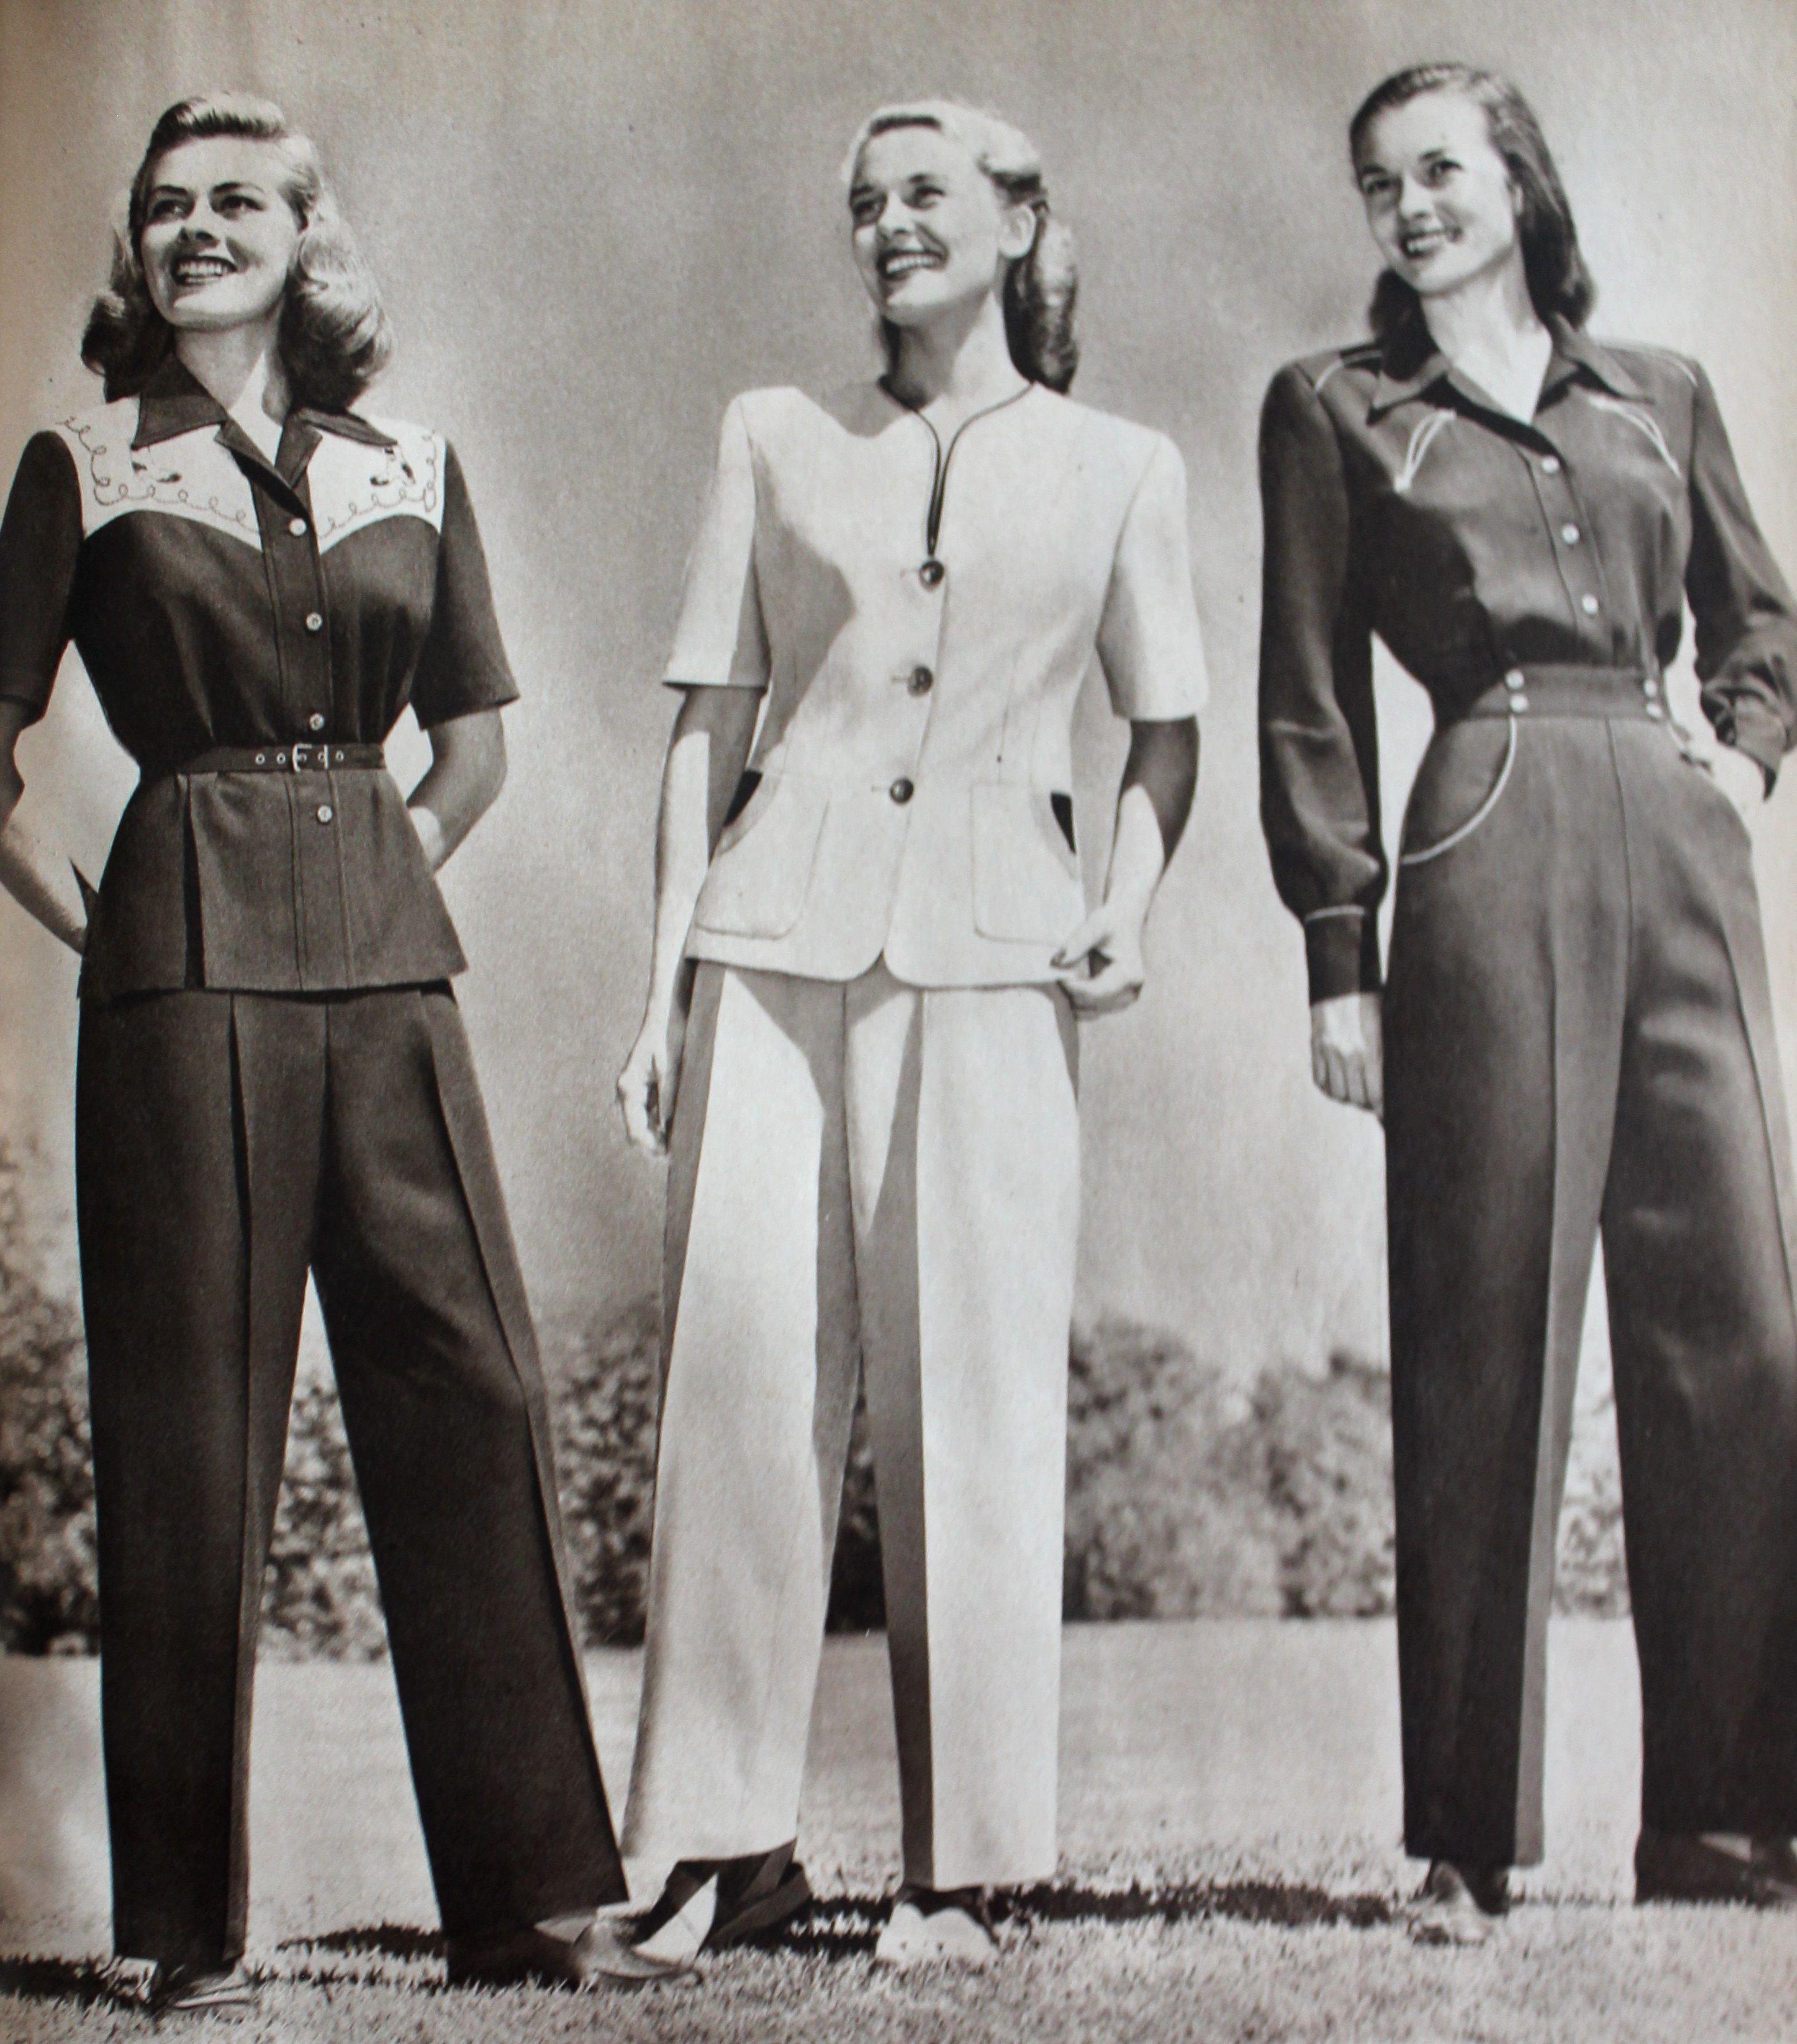 392a6c4edfa 1940s Ladies Workwear Clothes- Rosie s to Nurses